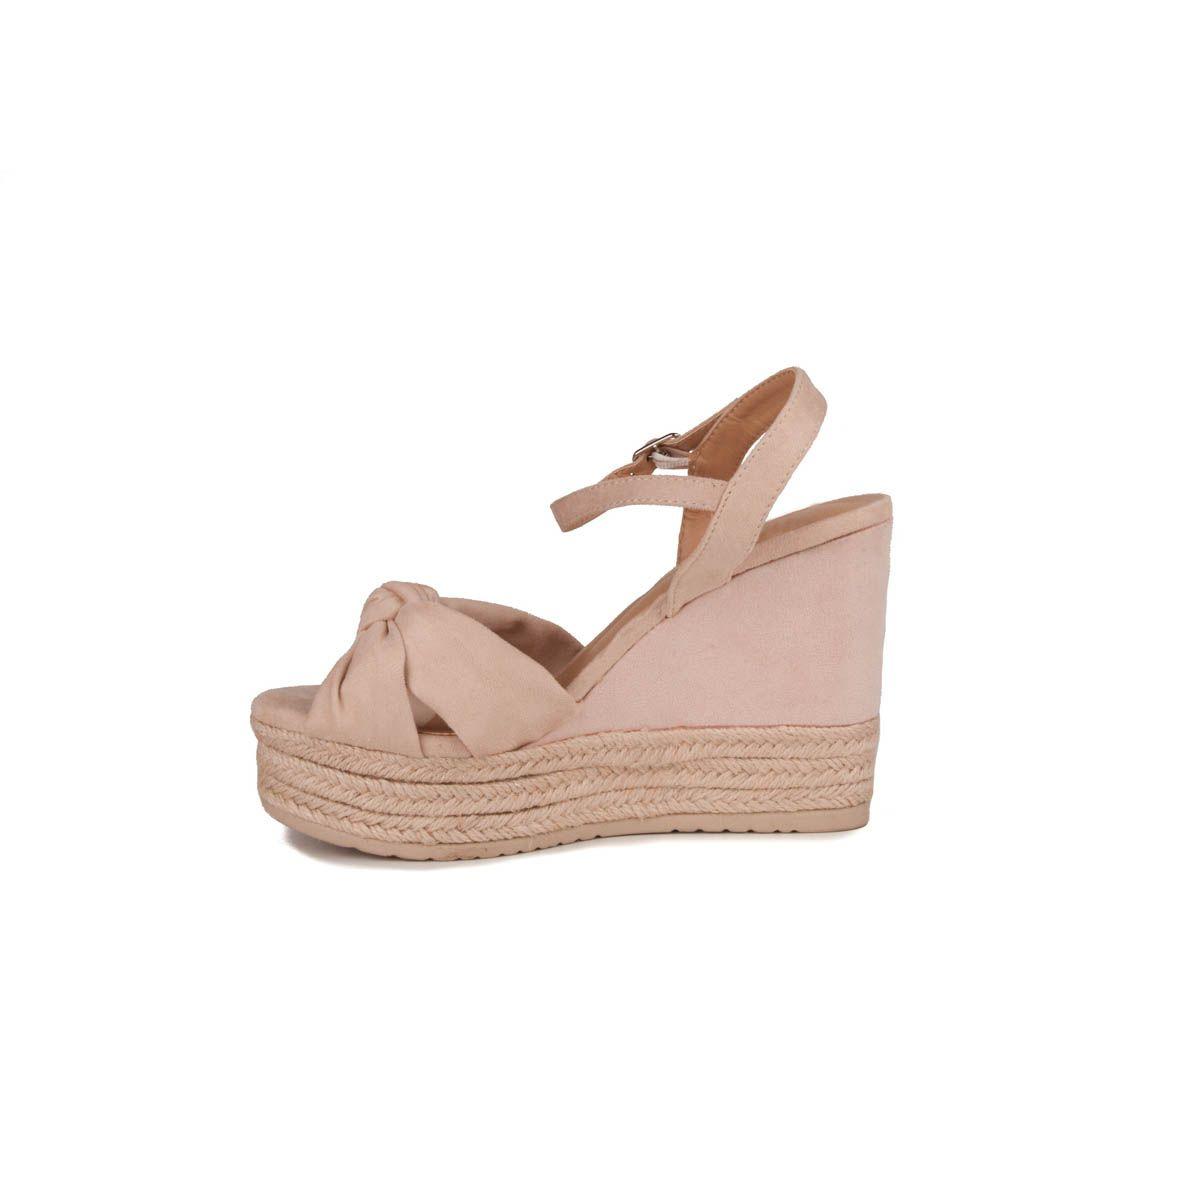 Montevita Chunky Heel Sandal in Beige